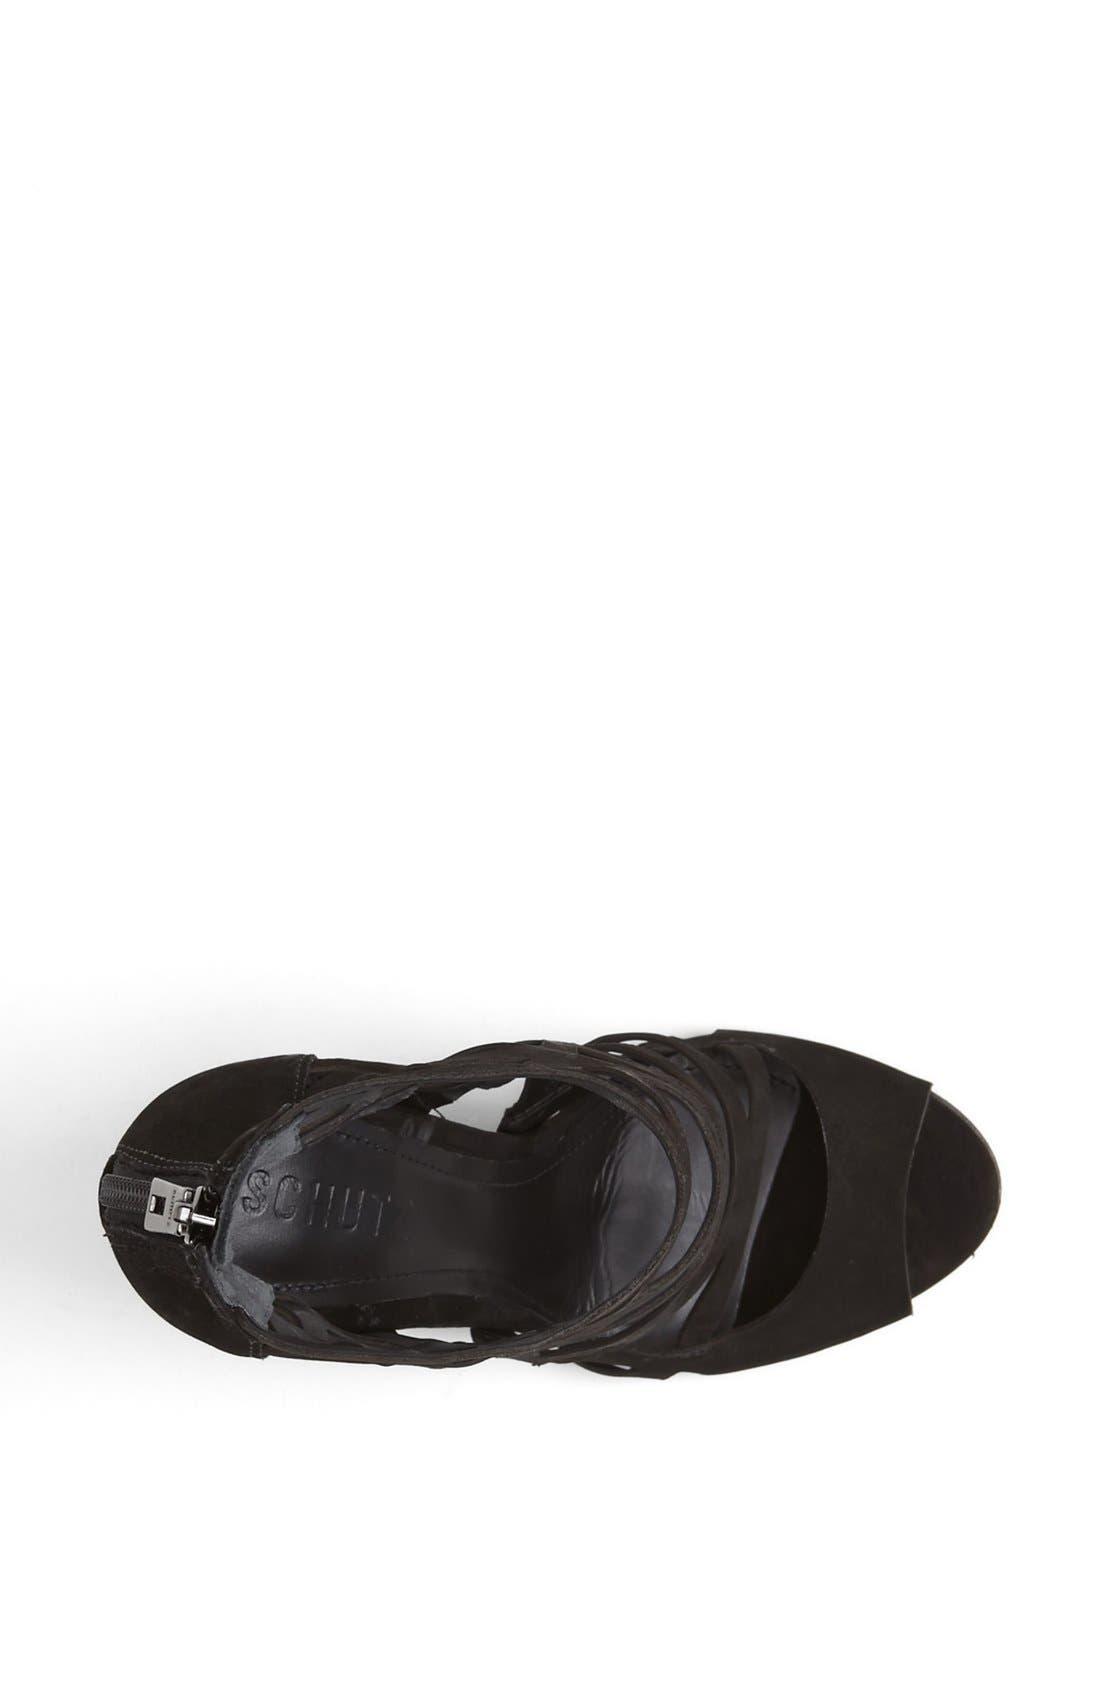 Alternate Image 3  - Schutz 'Carlee' Caged Sandal